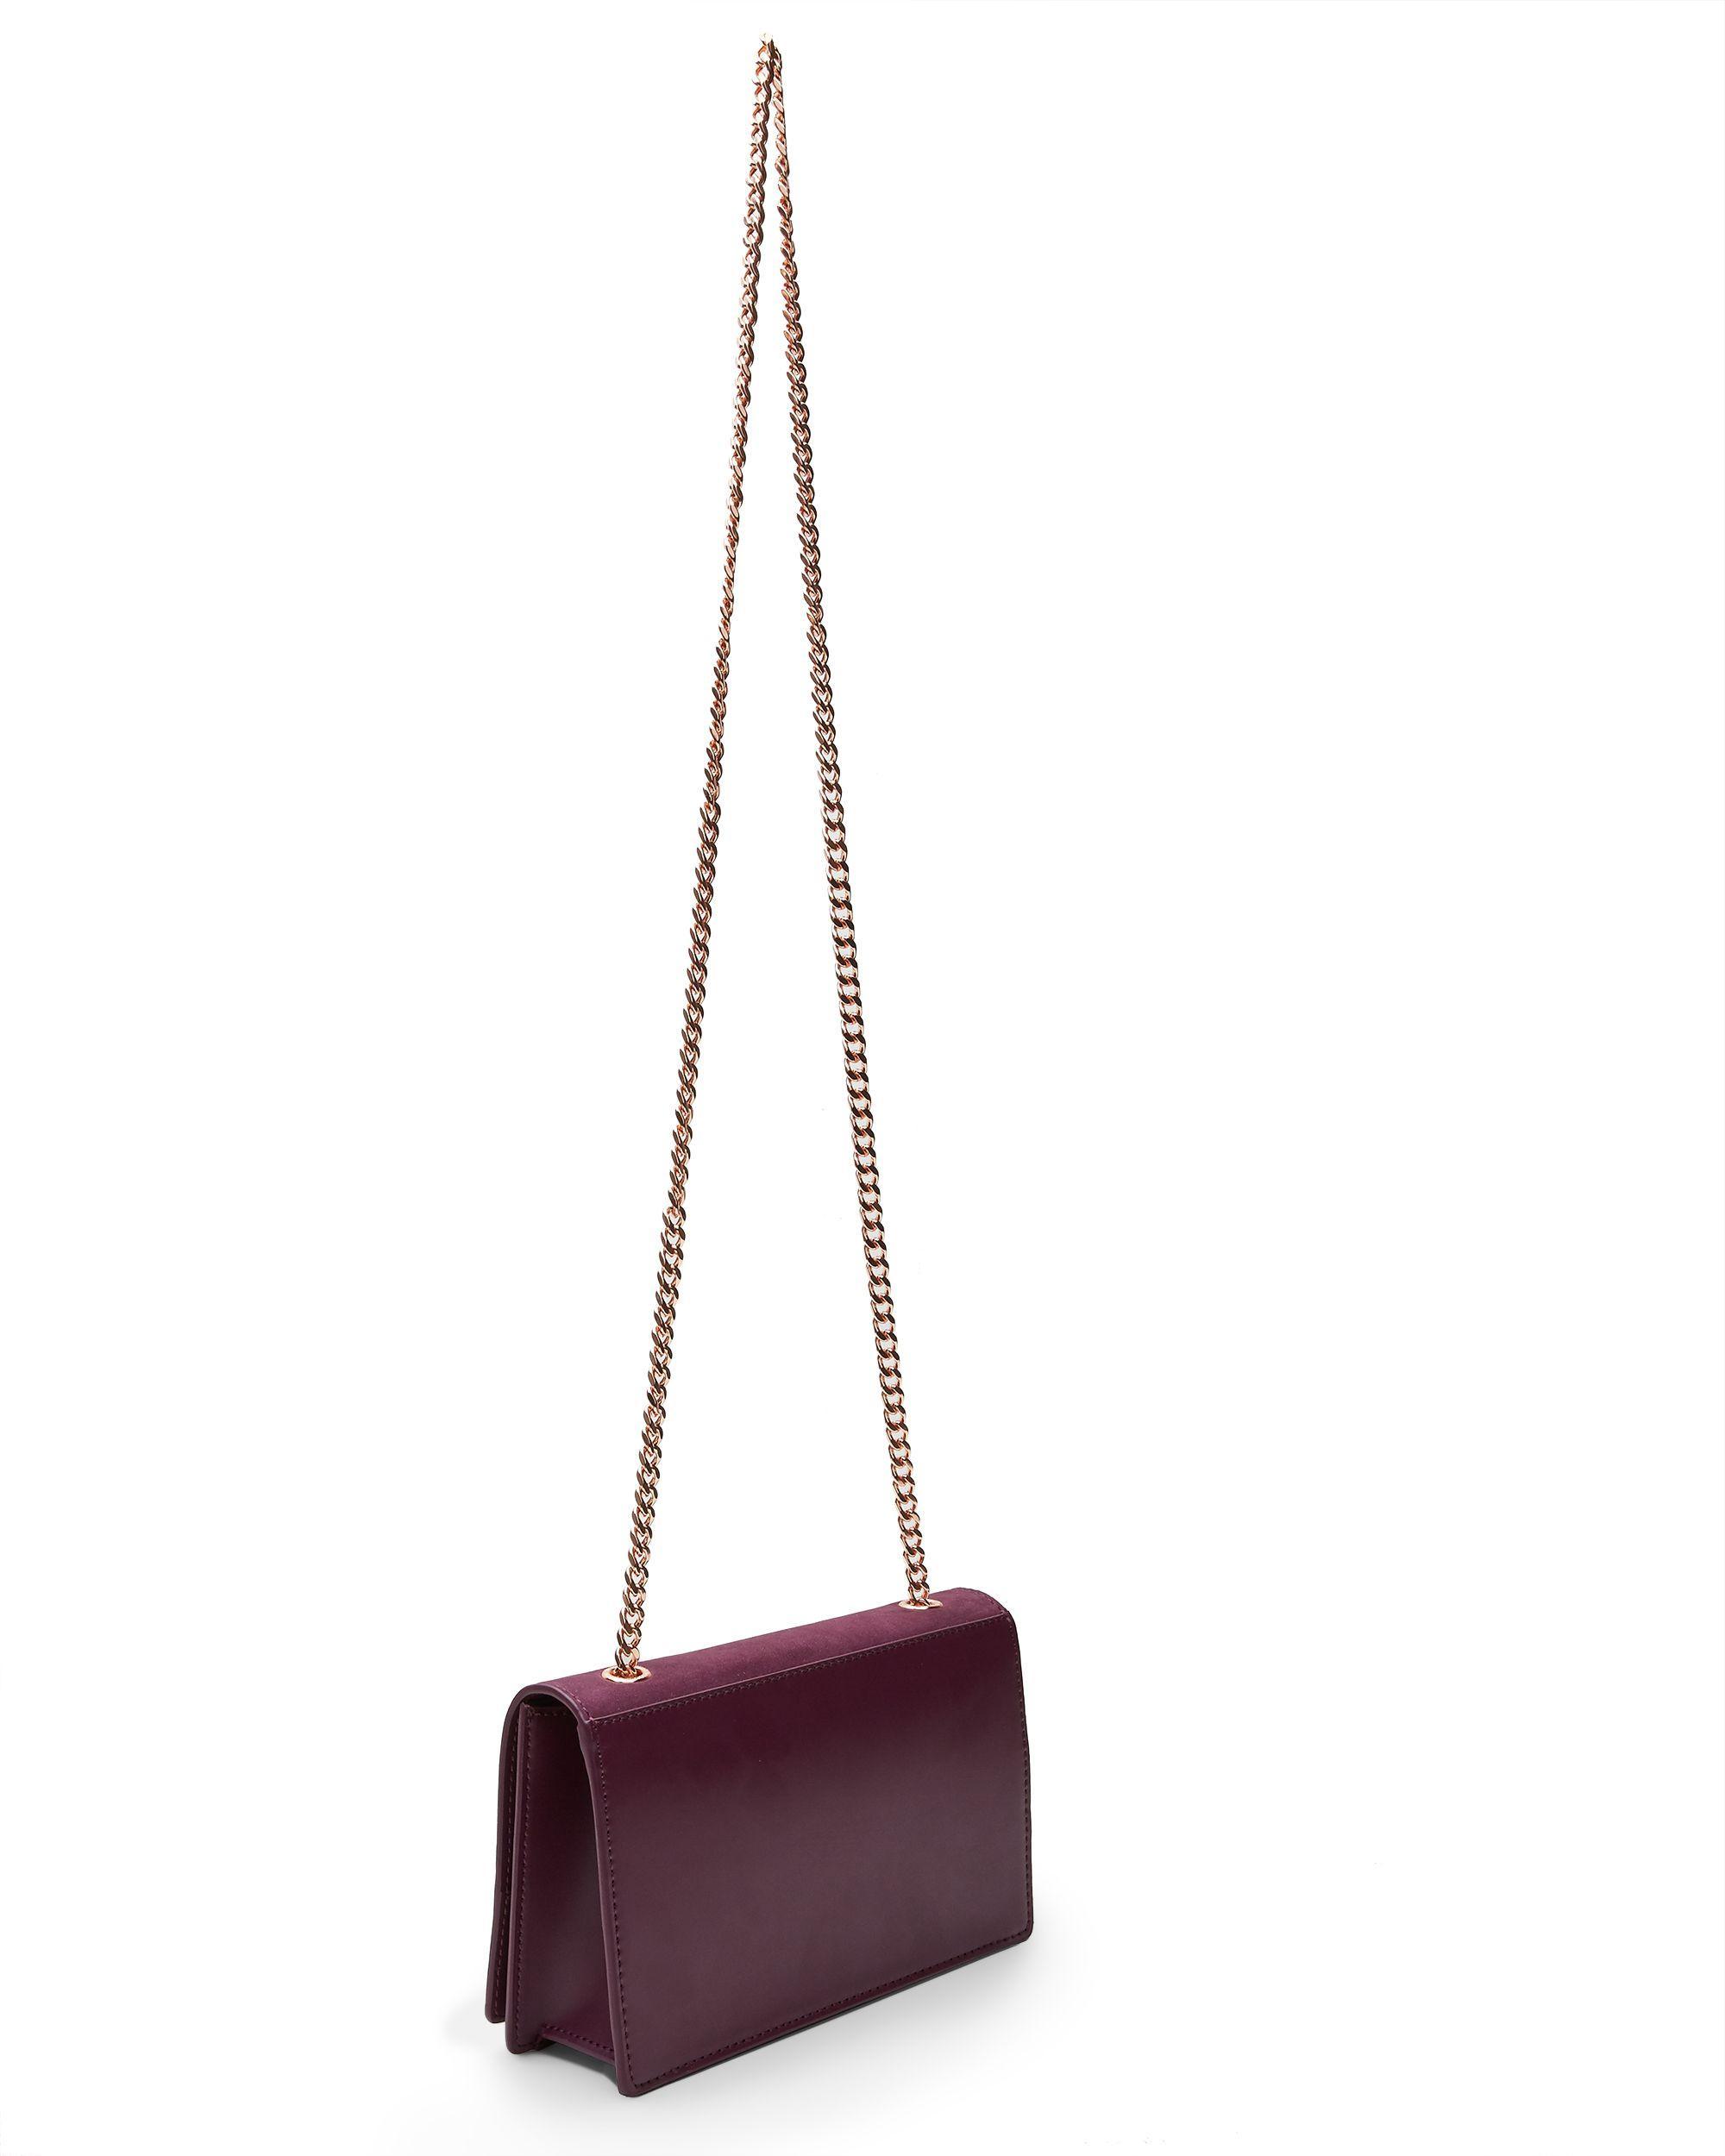 Ted Baker Avianna Studded Suede Cross Body Bag in Purple